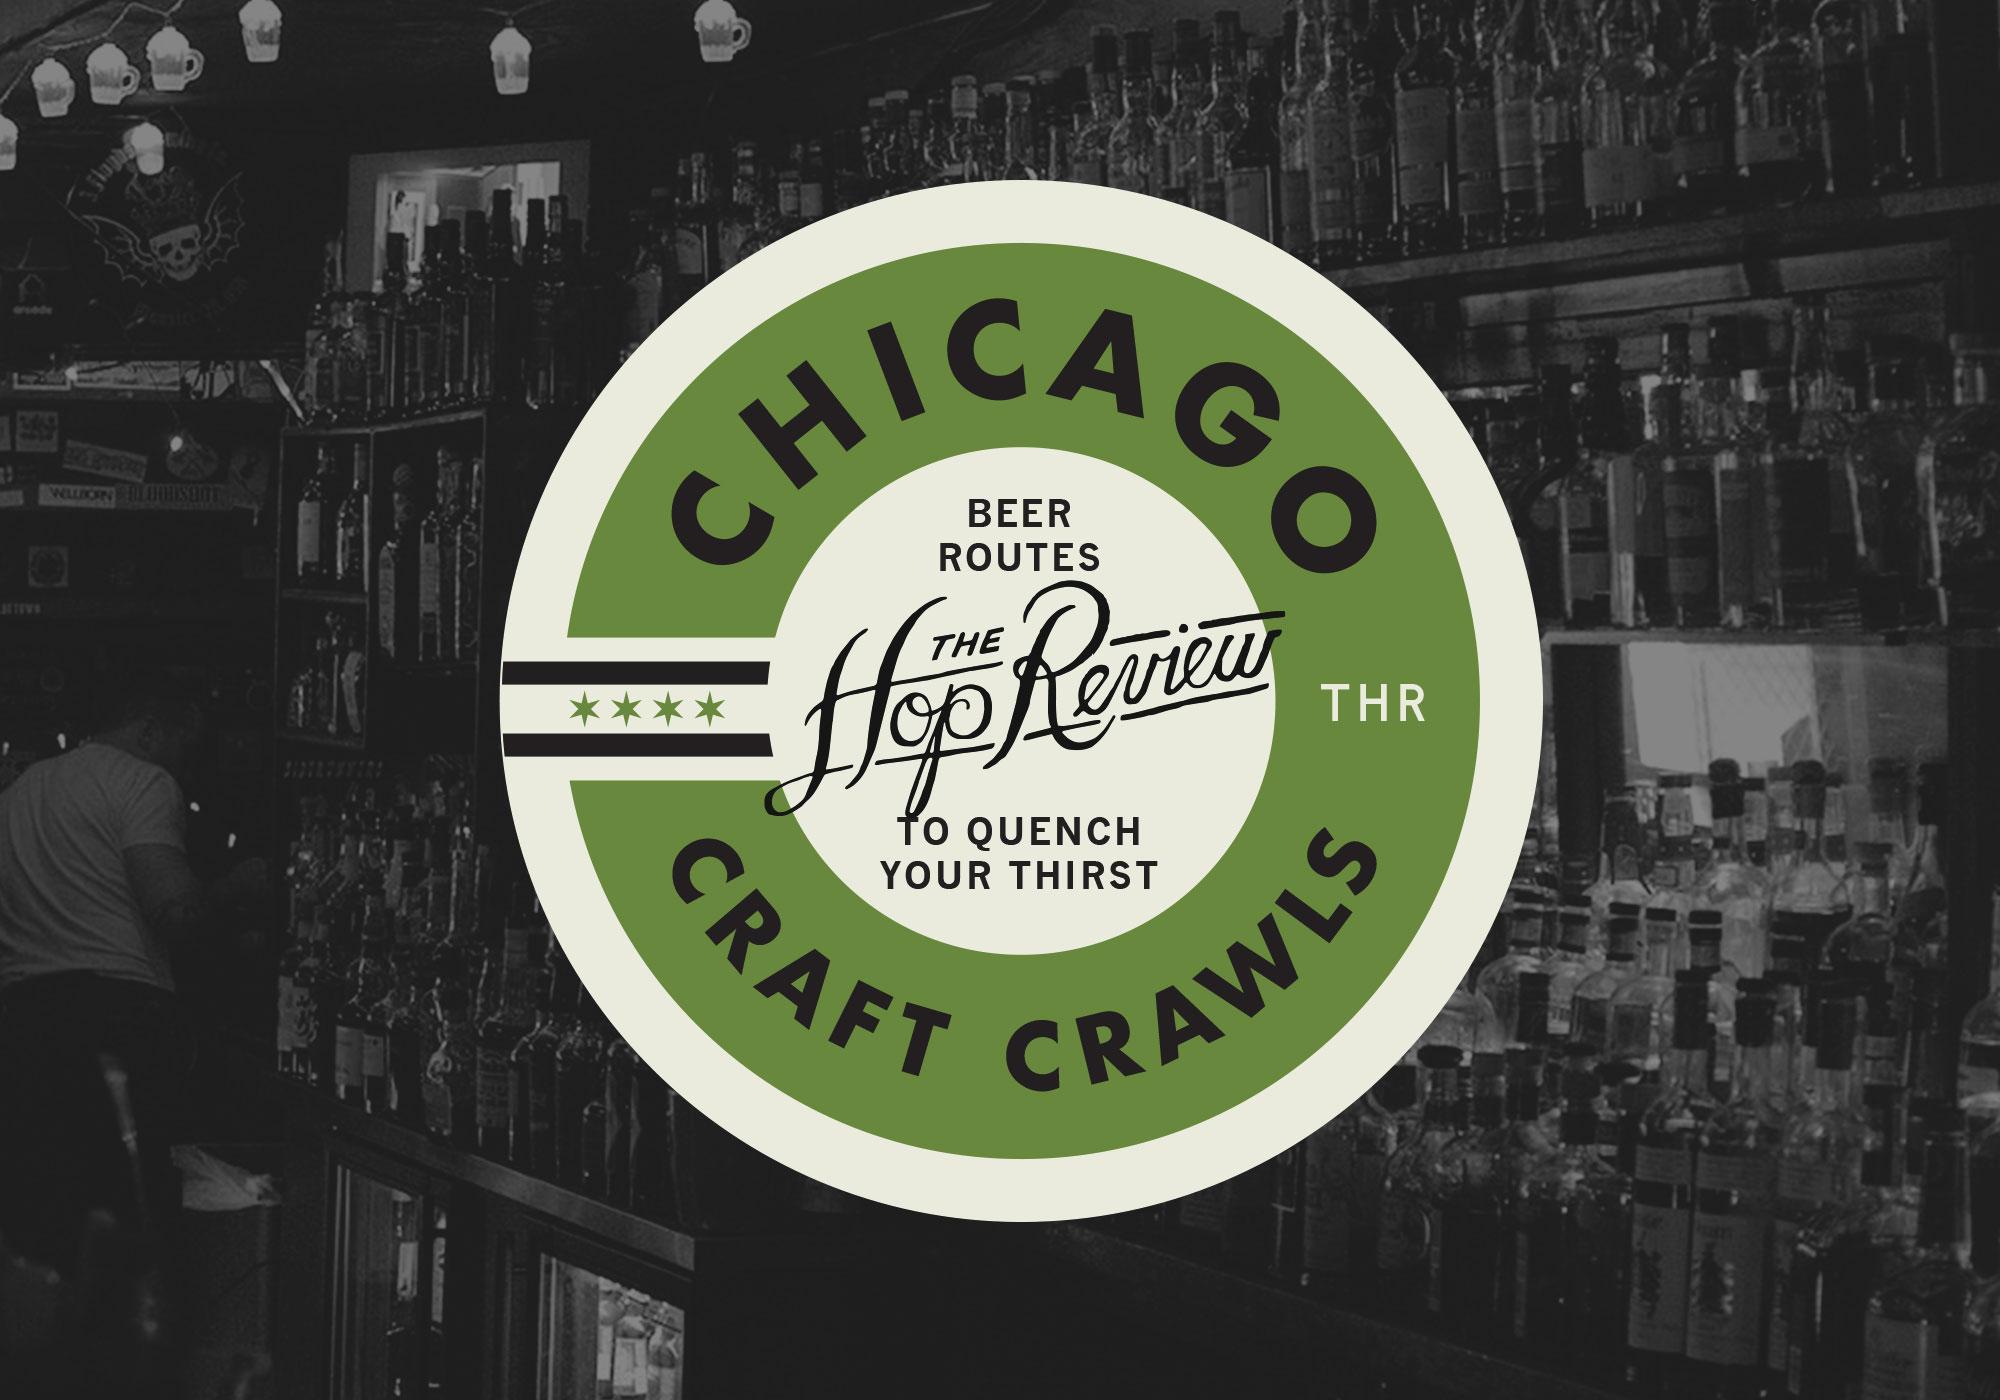 Chicago Craft Crawls